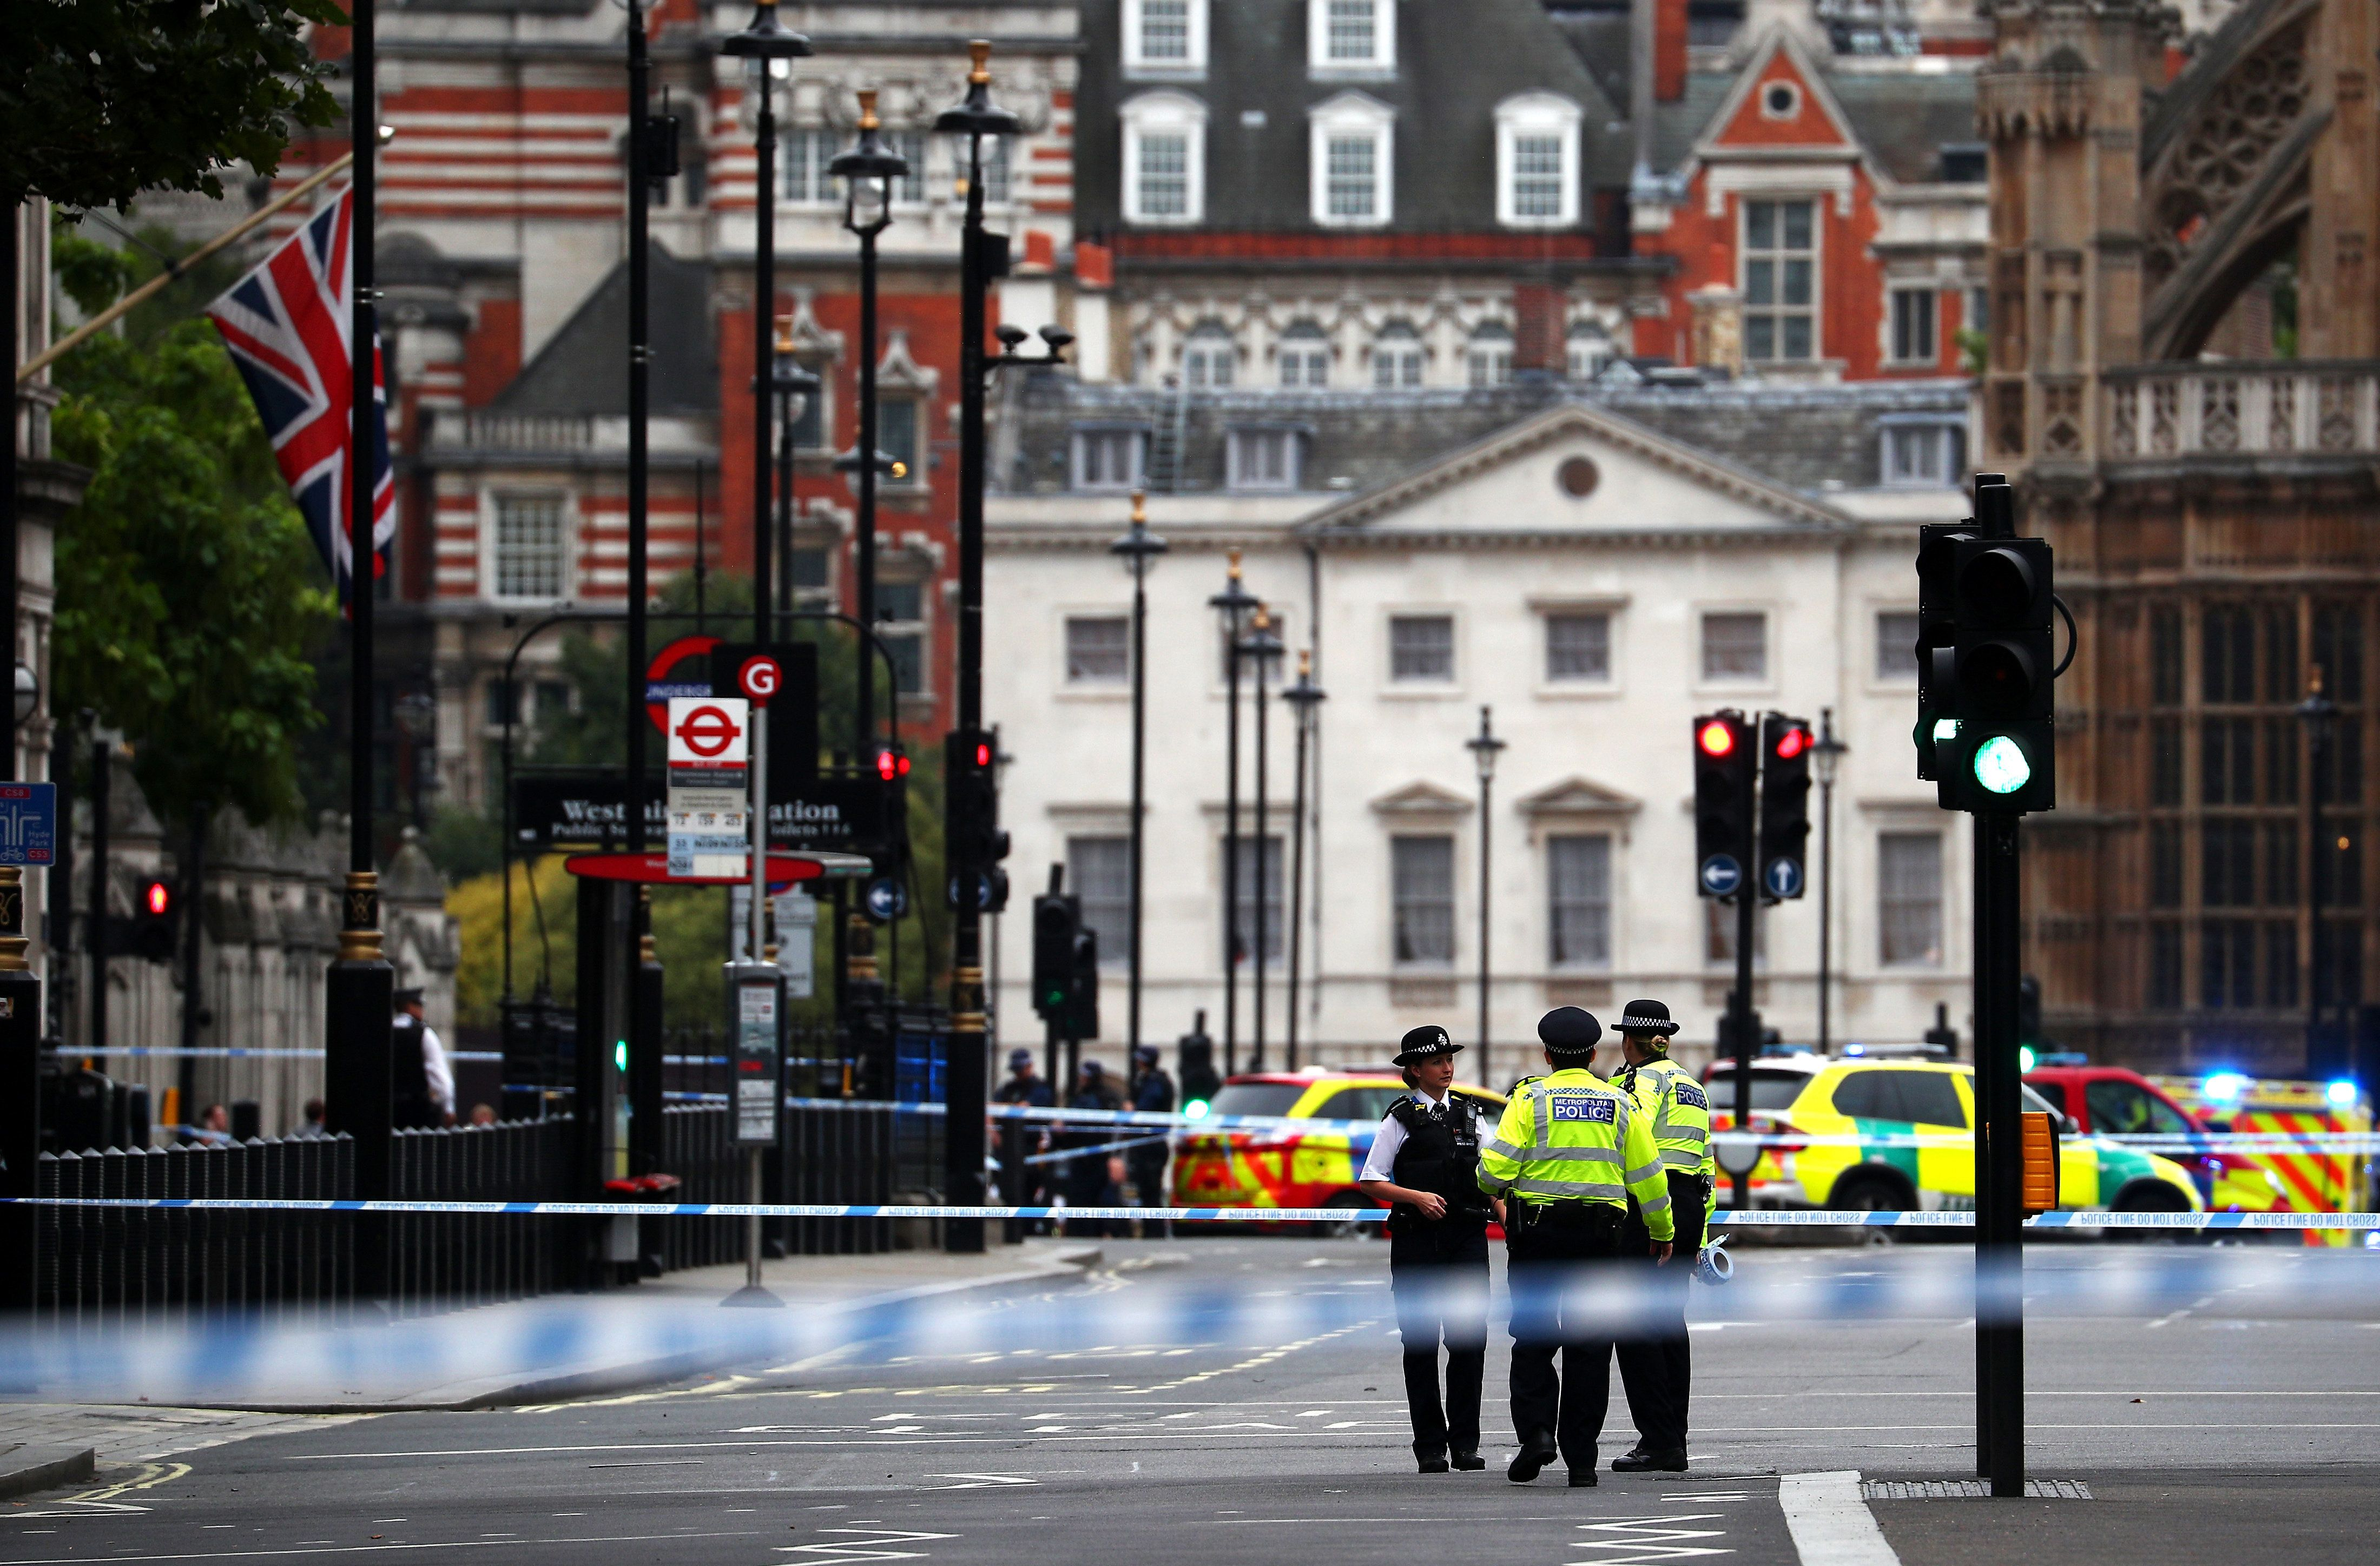 Man Arrested For Terrorist Offenses After Car Crashes Into Barrier Outside UK